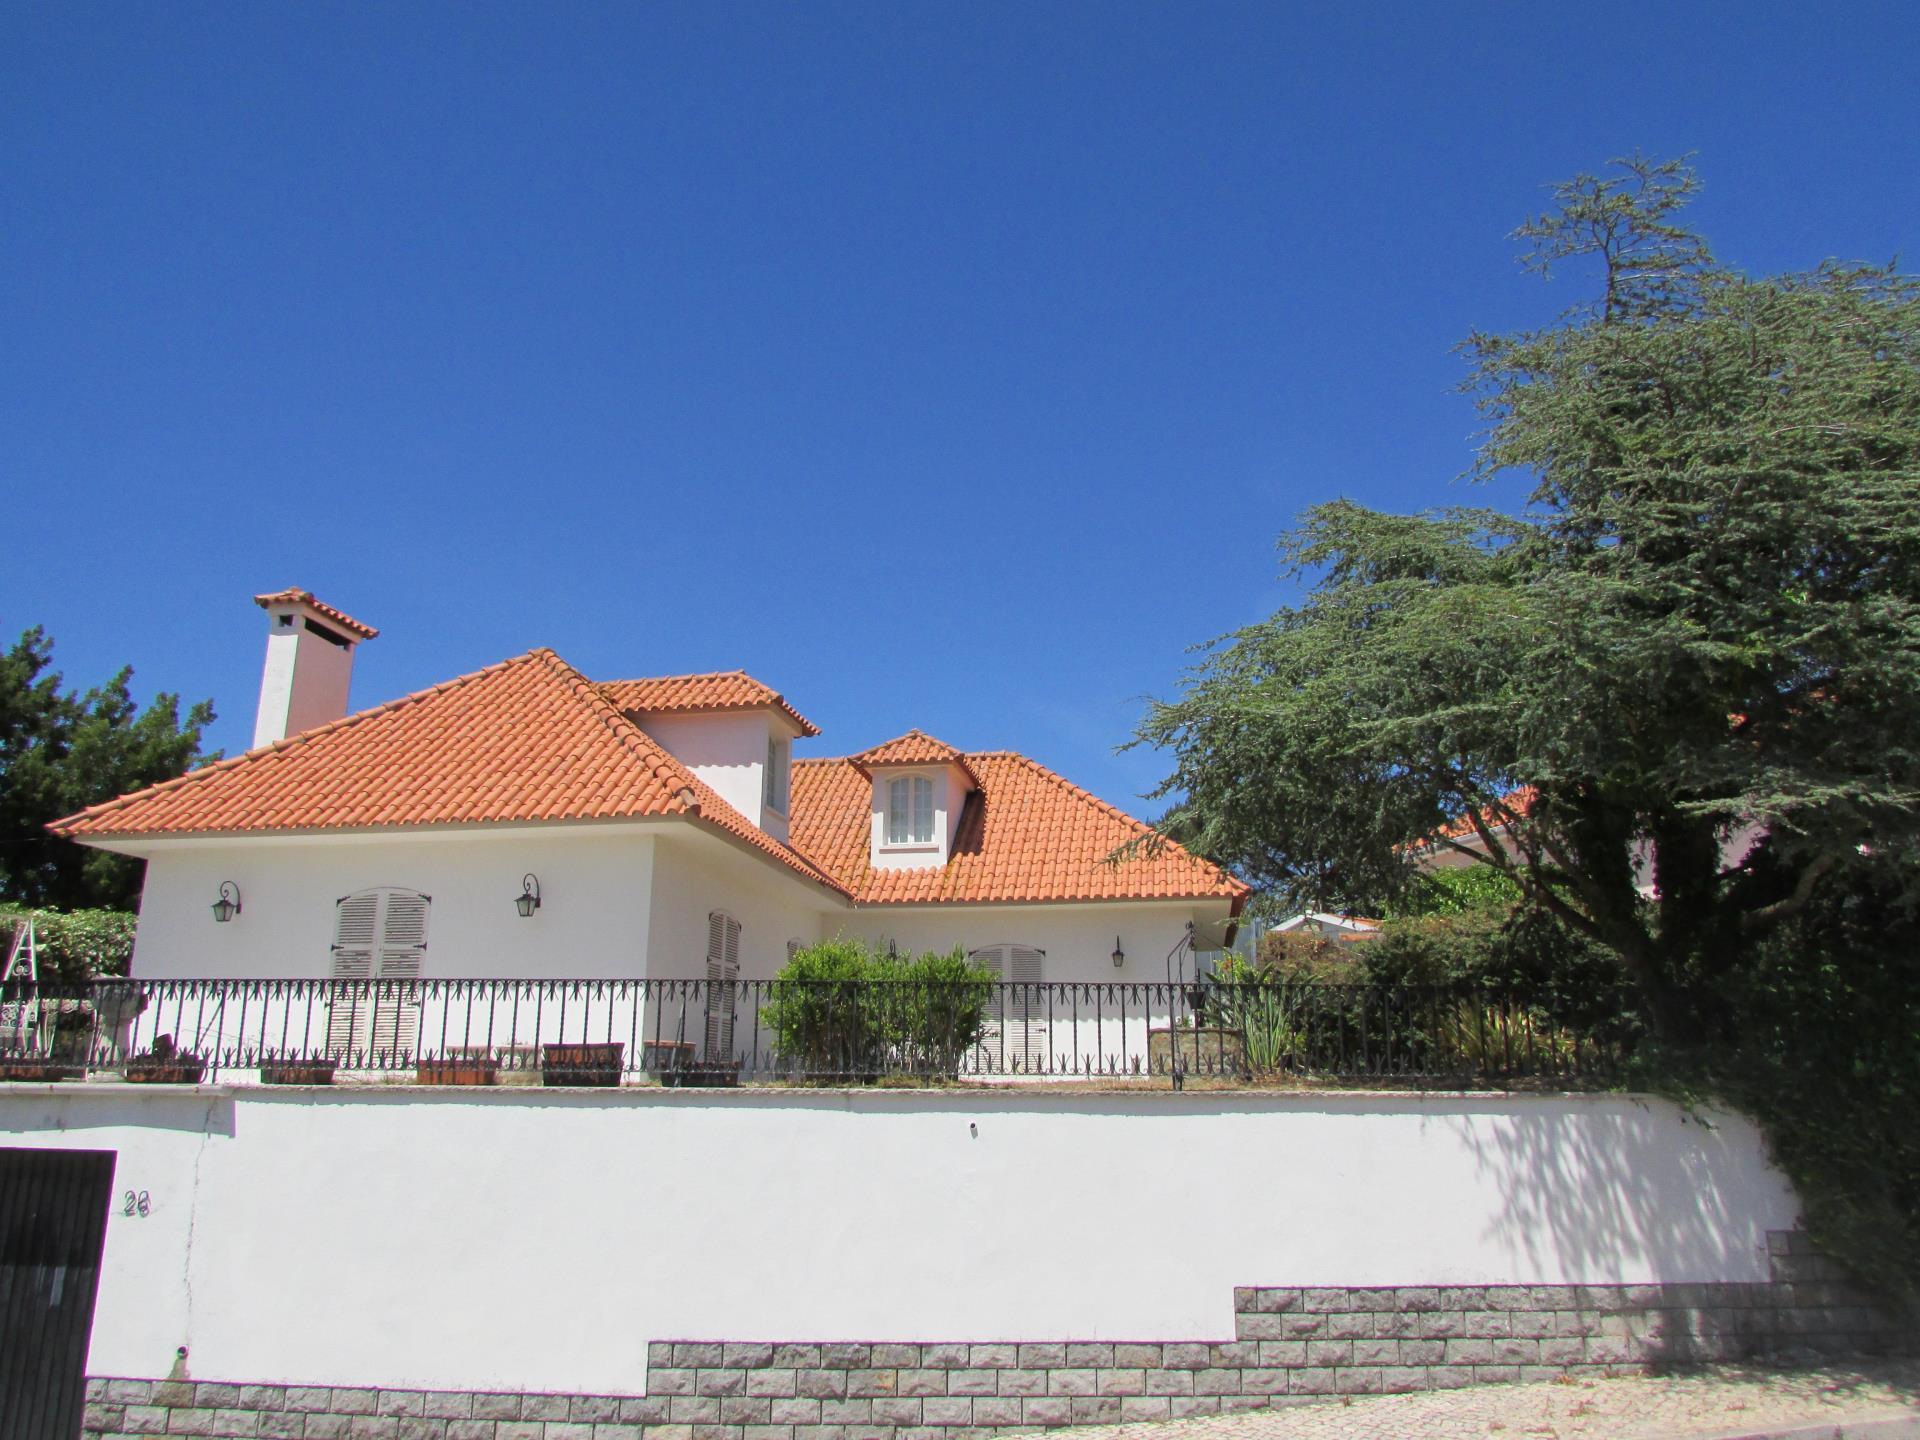 独户住宅 为 销售 在 House, 3 bedrooms, for Sale Galamares, Sintra, 葡京 葡萄牙